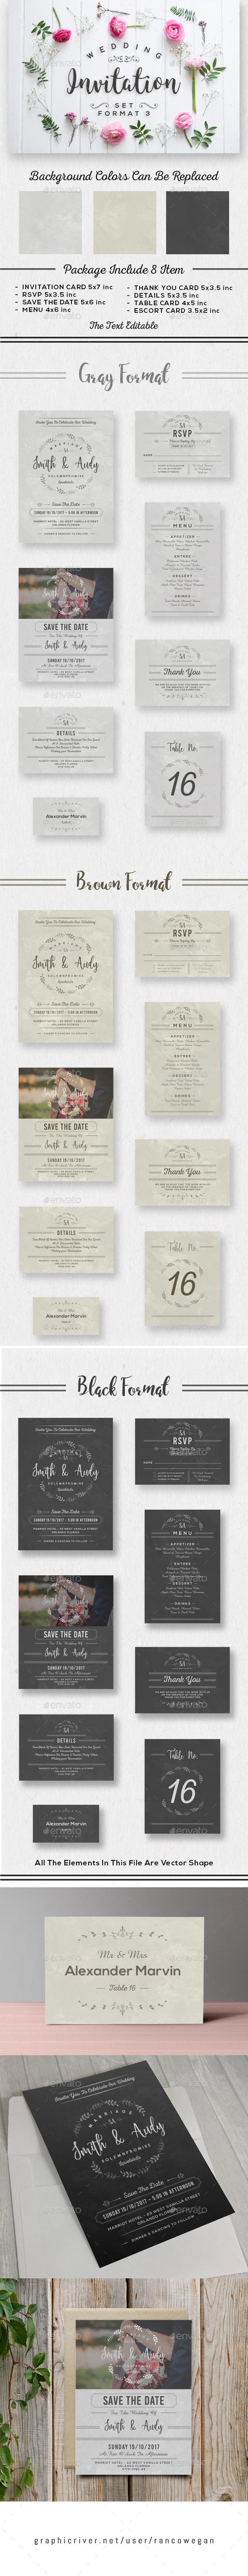 Wedding Invitation Set Format 3 - Weddings Cards & Invites